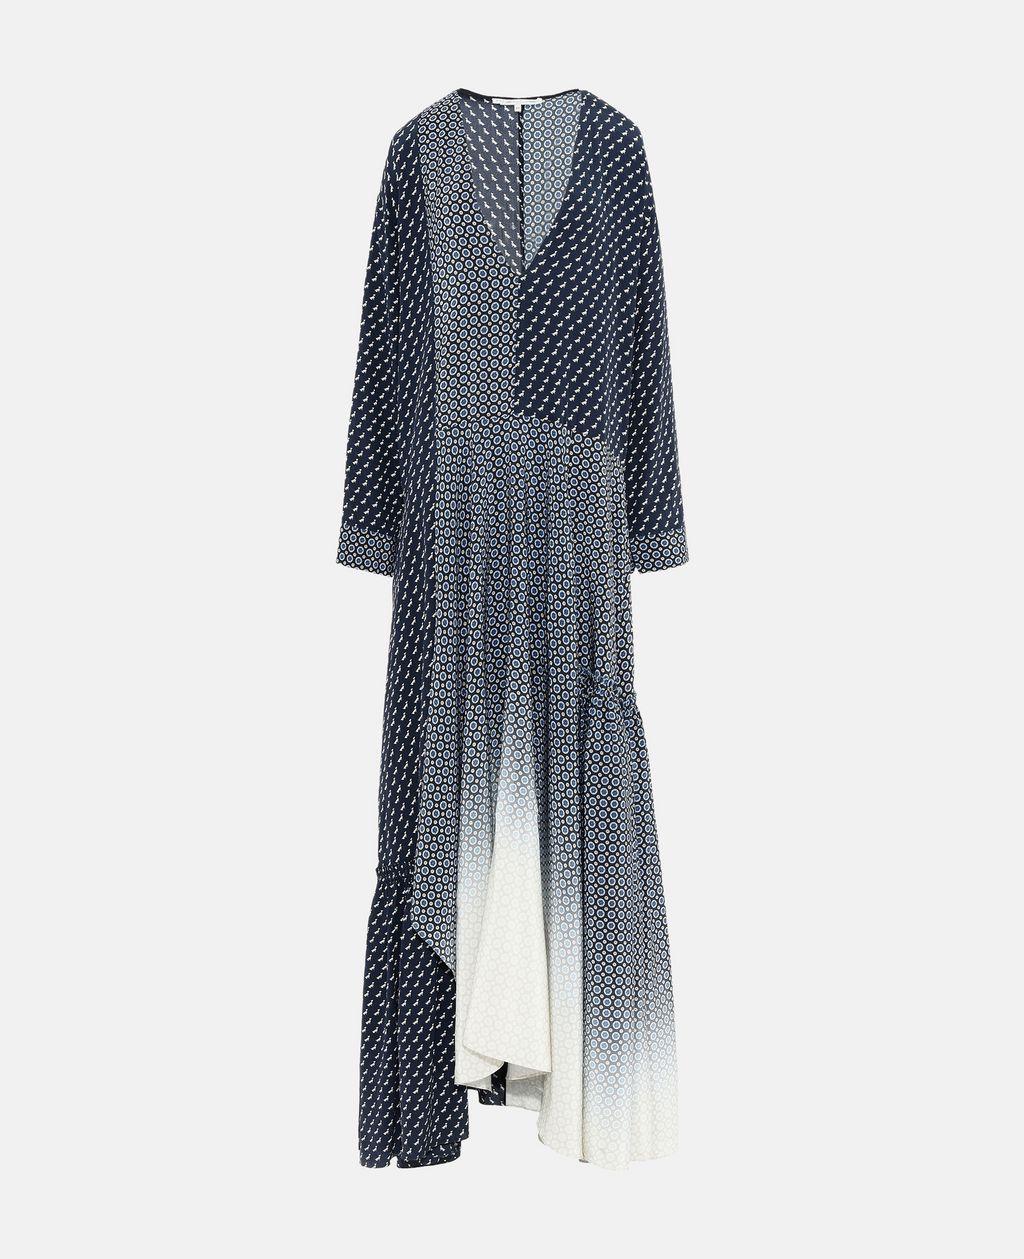 Dominique Tie Print Dress - STELLA MCCARTNEY